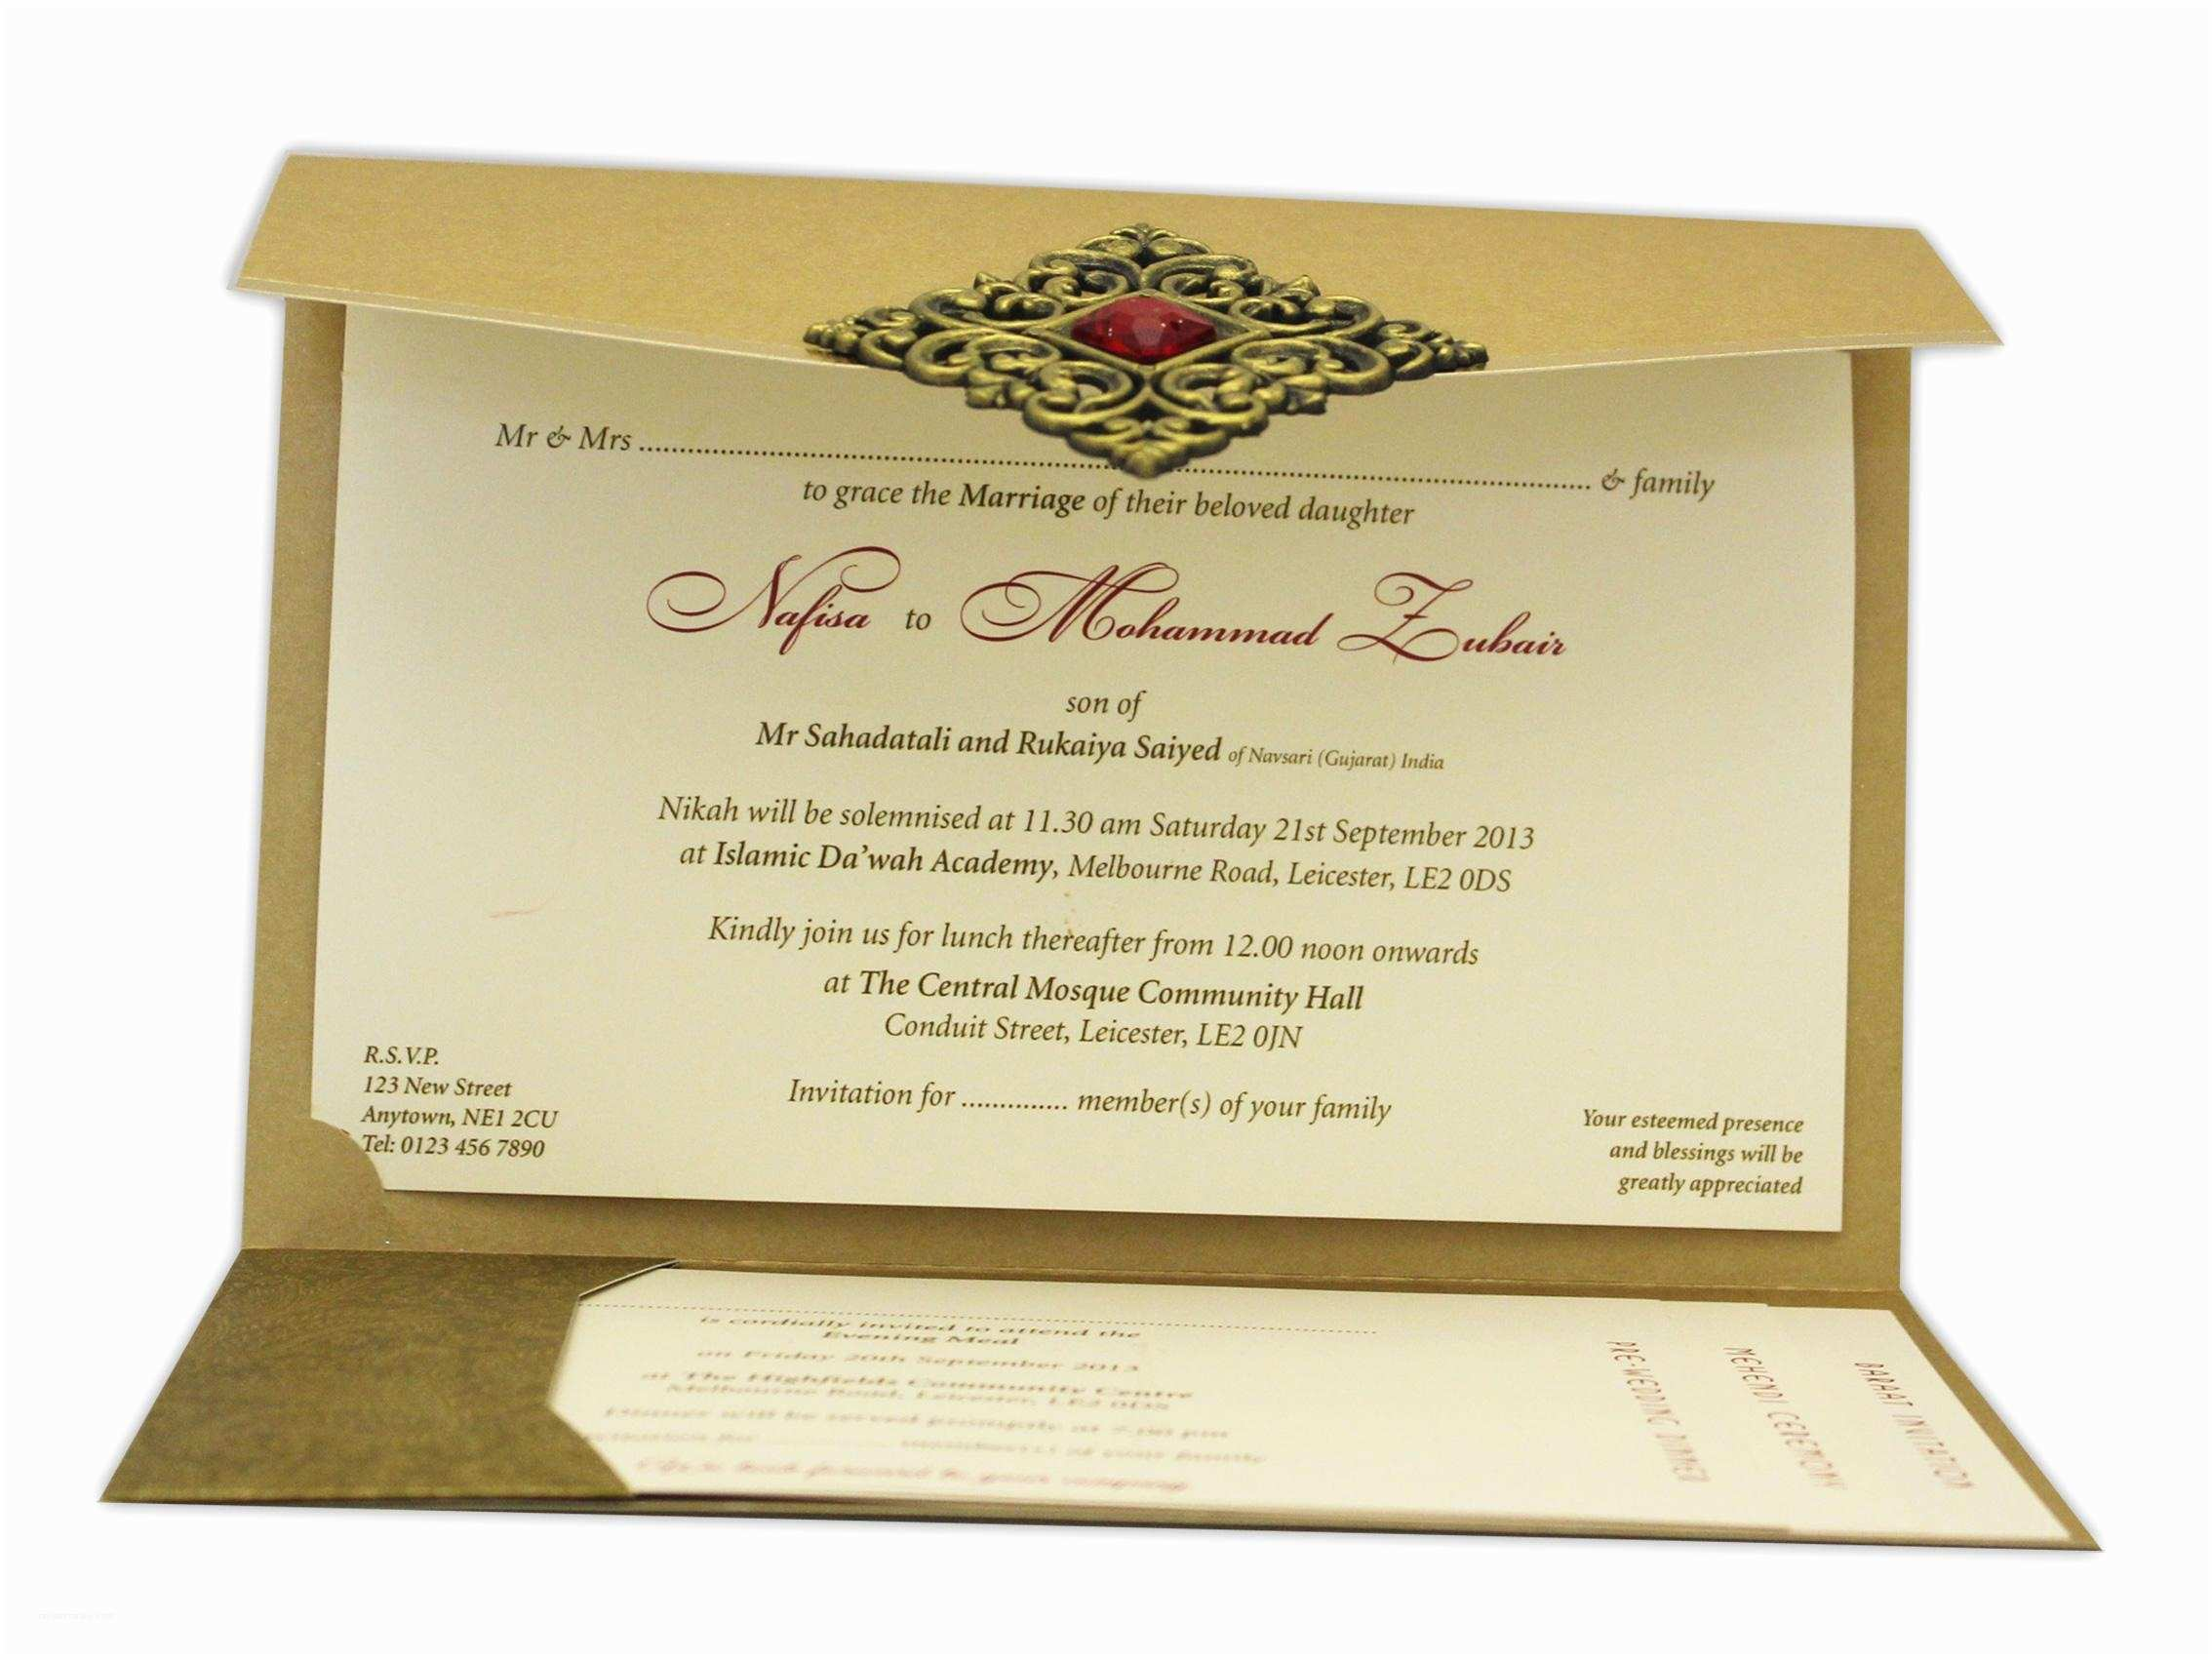 Indian Wedding Invitations Indian Wedding Invitation Cards Indian Wedding